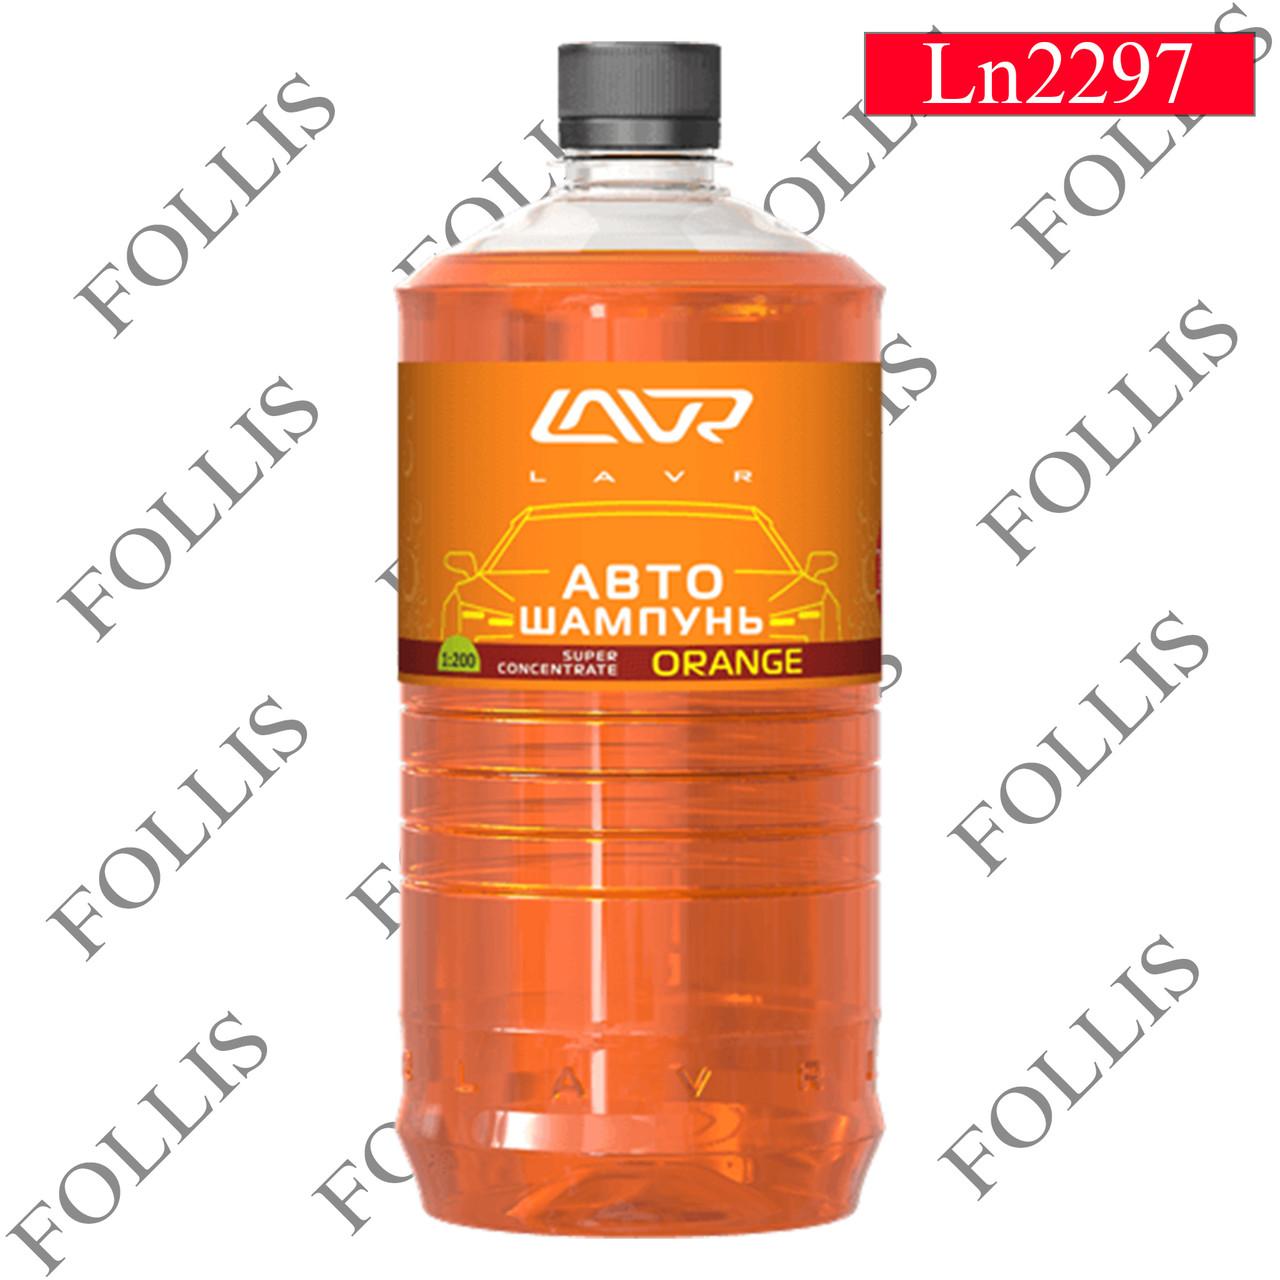 Автошампунь-суперконцентрат Orange 1:120 - 1:320 LAVR Auto Shampoo Super Concentrate, 1000мл